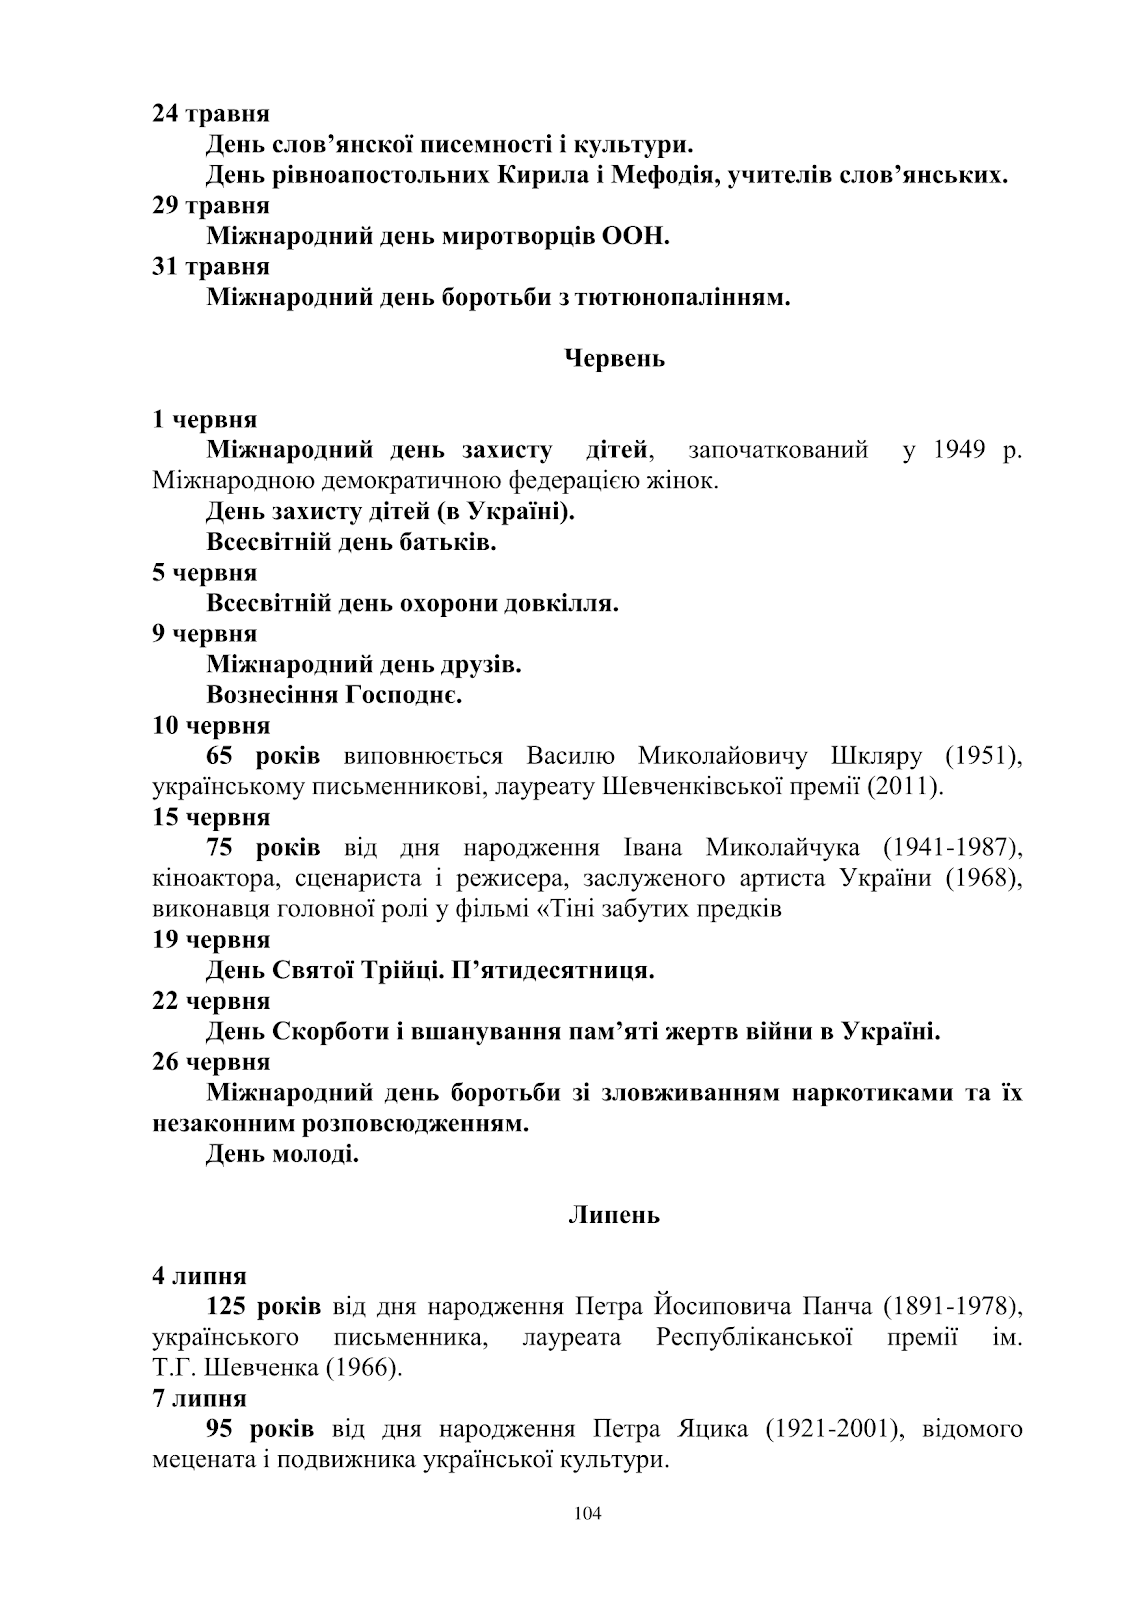 C:\Users\Валерия\Desktop\план 2016 рік\план 2016 рік-104.png